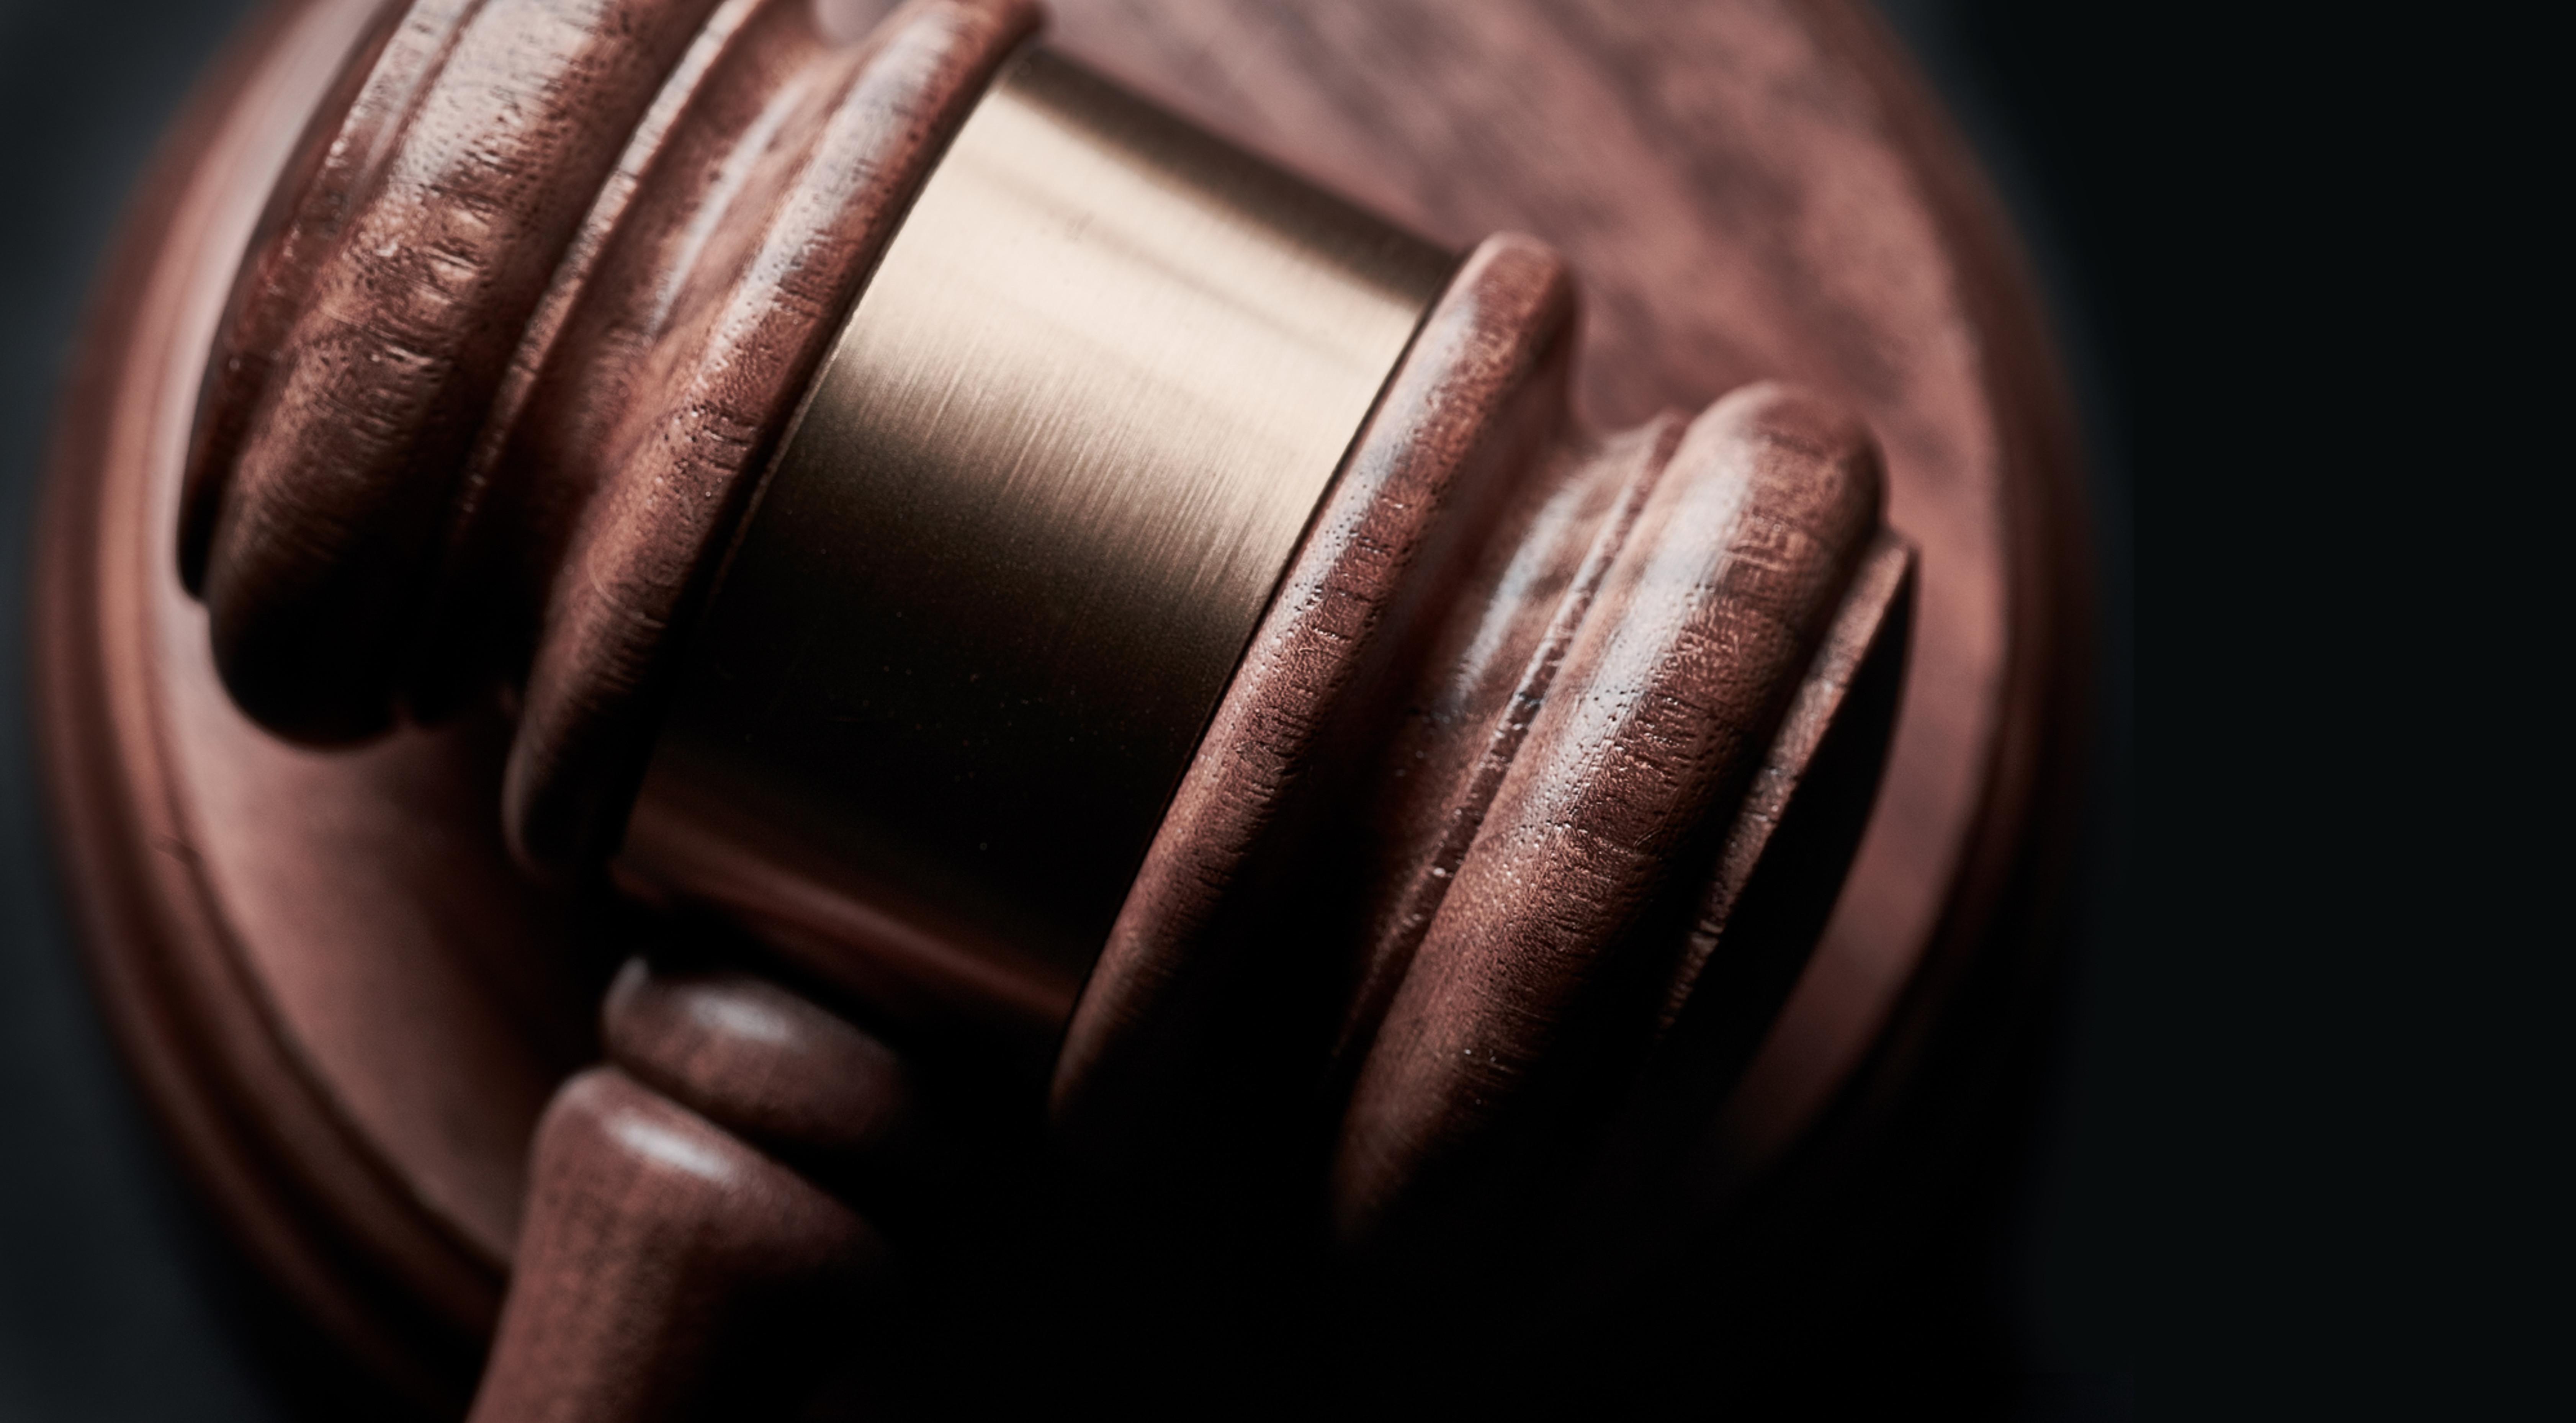 Legal Accompaniment